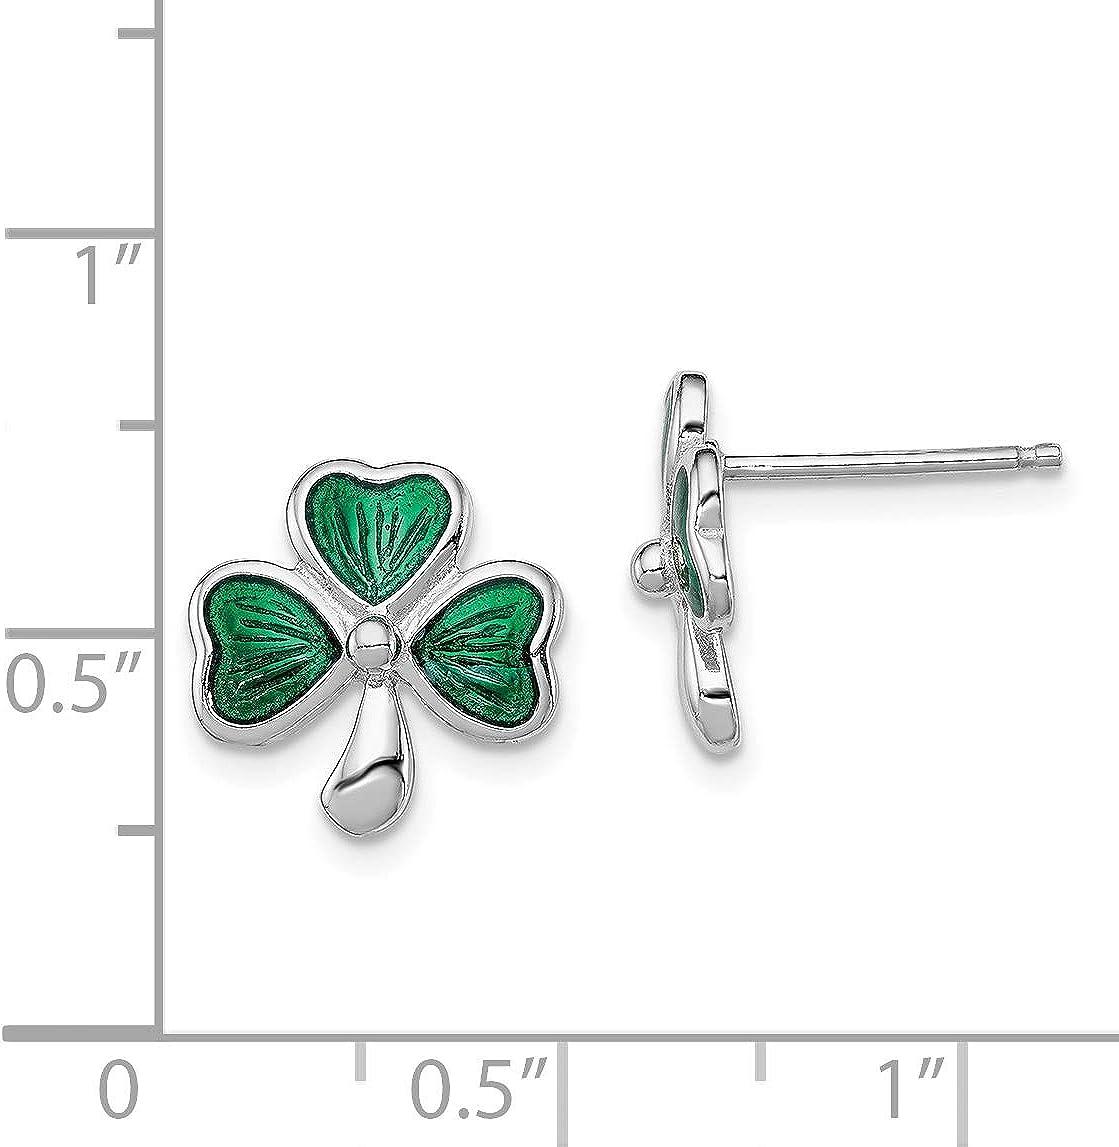 Madi K Sterling Silver Green Enameled Shamrock Post Earrings and a pair of 4mm CZ Stud Earrings